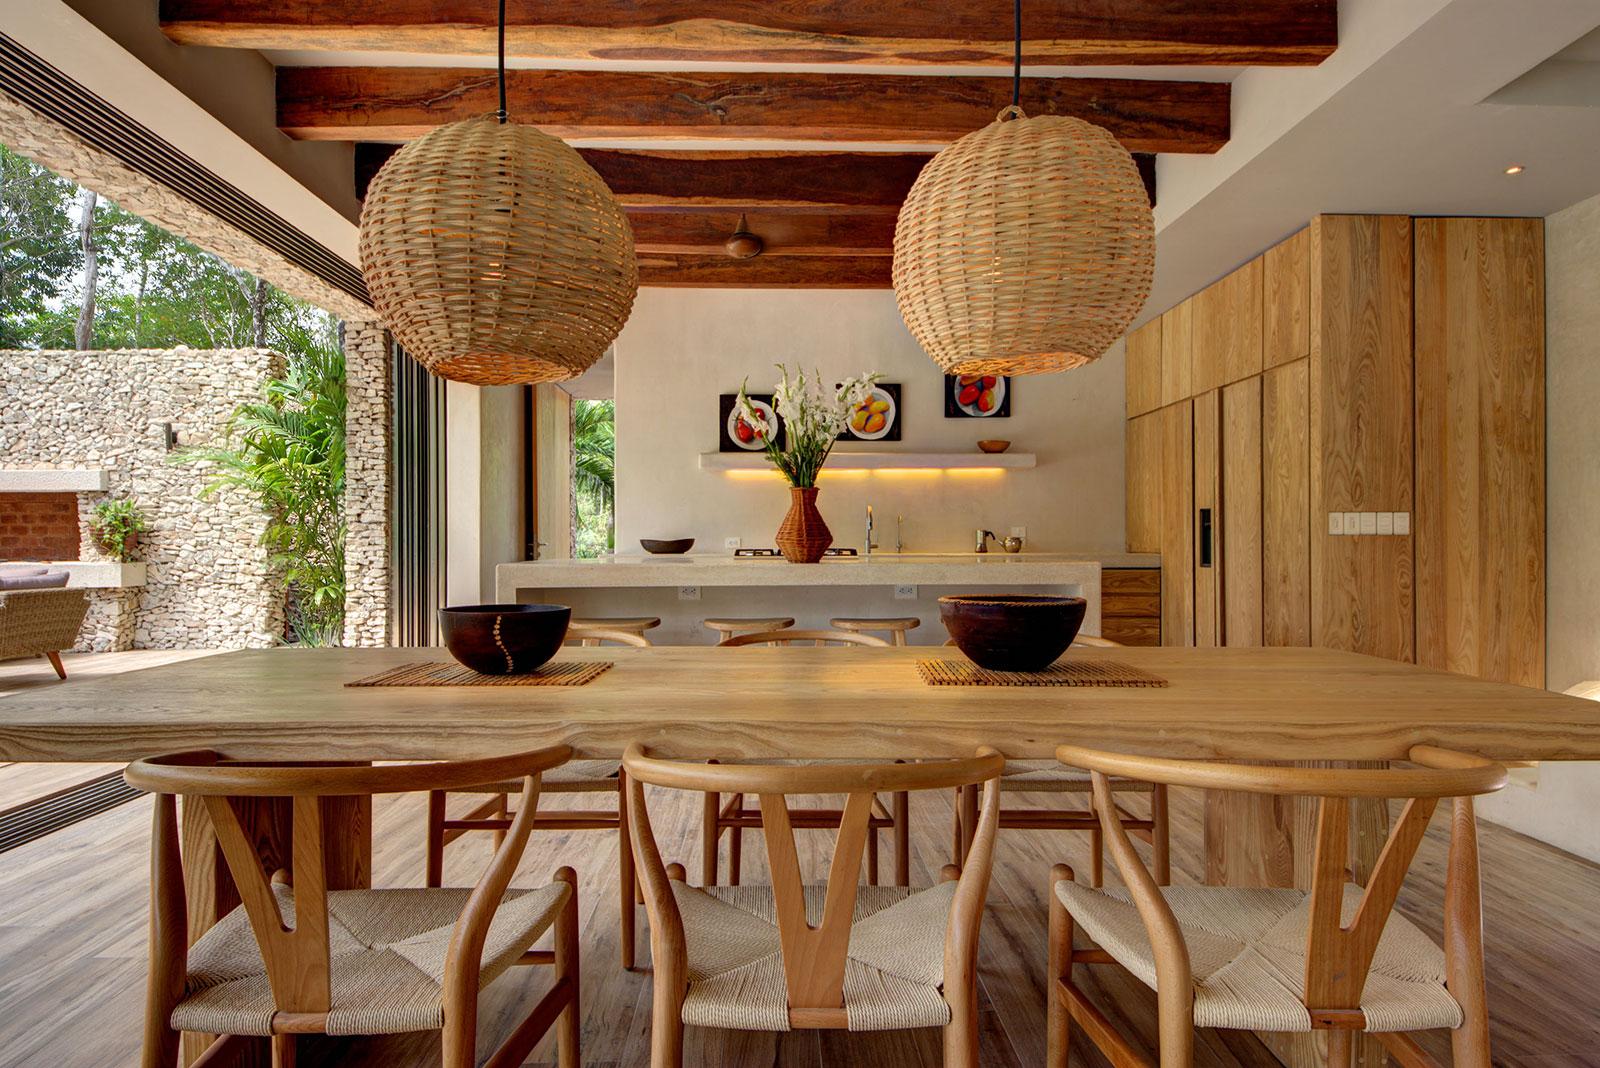 Maya_Luxe_Riviera_Maya_Luxury_Villas_Experiences_Tulum_Town_4_Bedrooms_Villa_Verde_10 (1).jpg